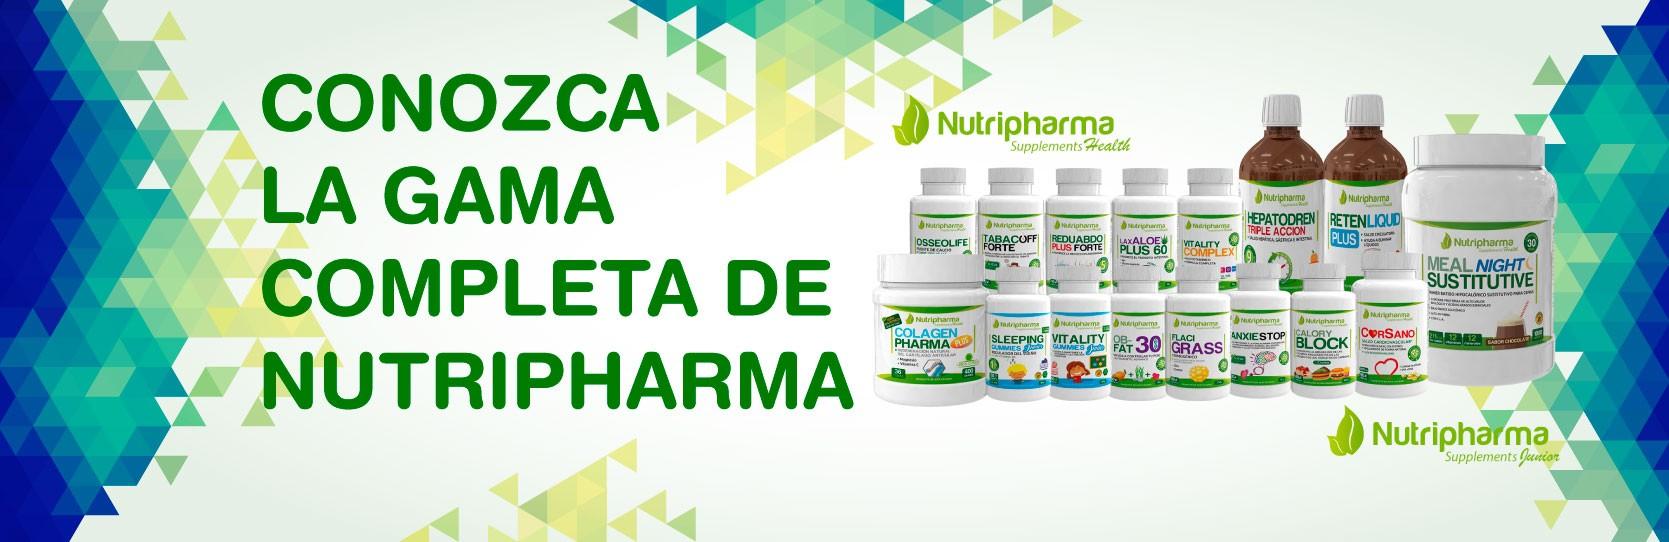 NUTRIPHARMA HEALT